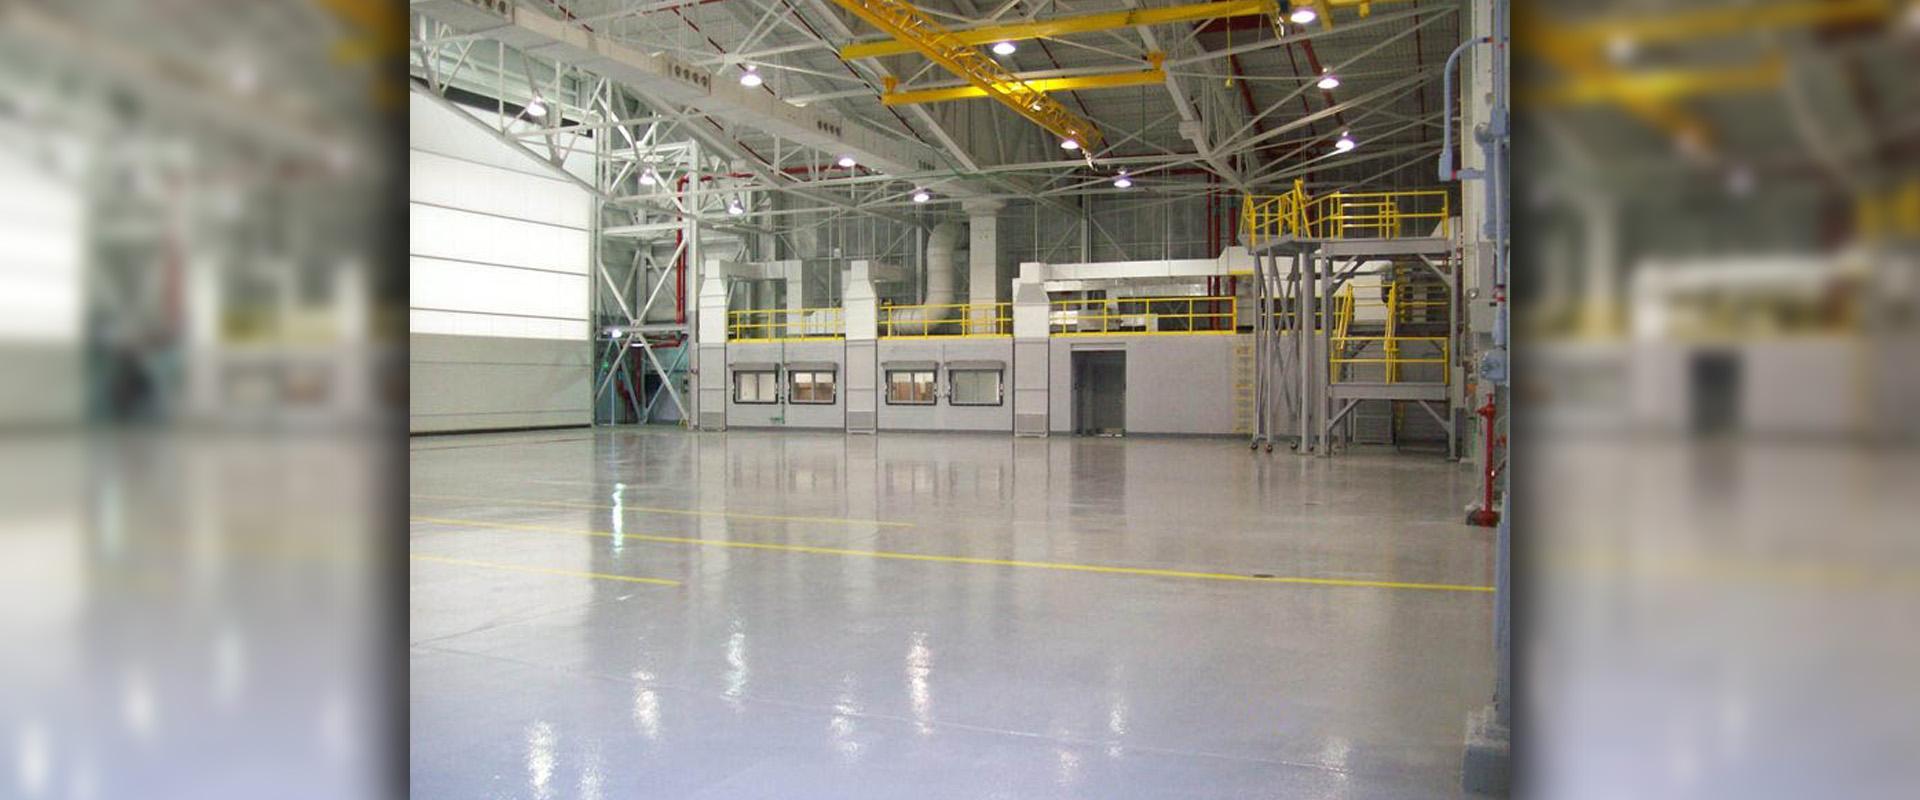 Lockheed Martin B82, B83 and B84 Hangars - B82 Hangar